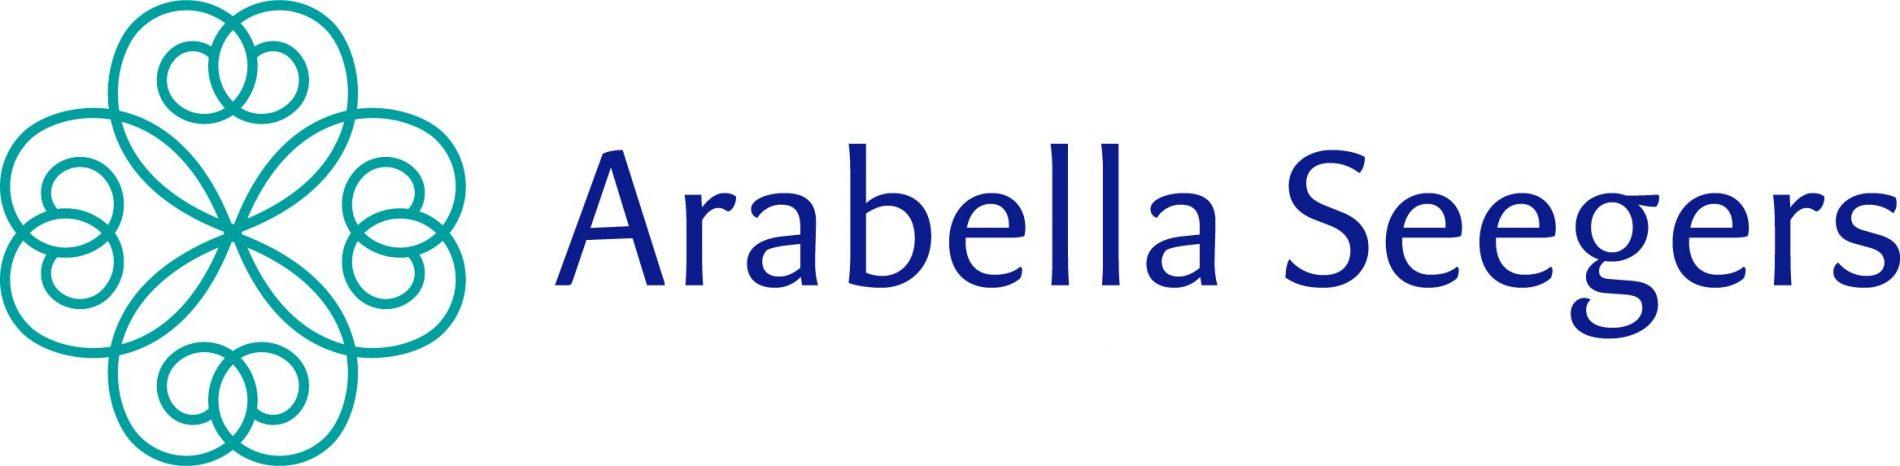 Arabella Seegers